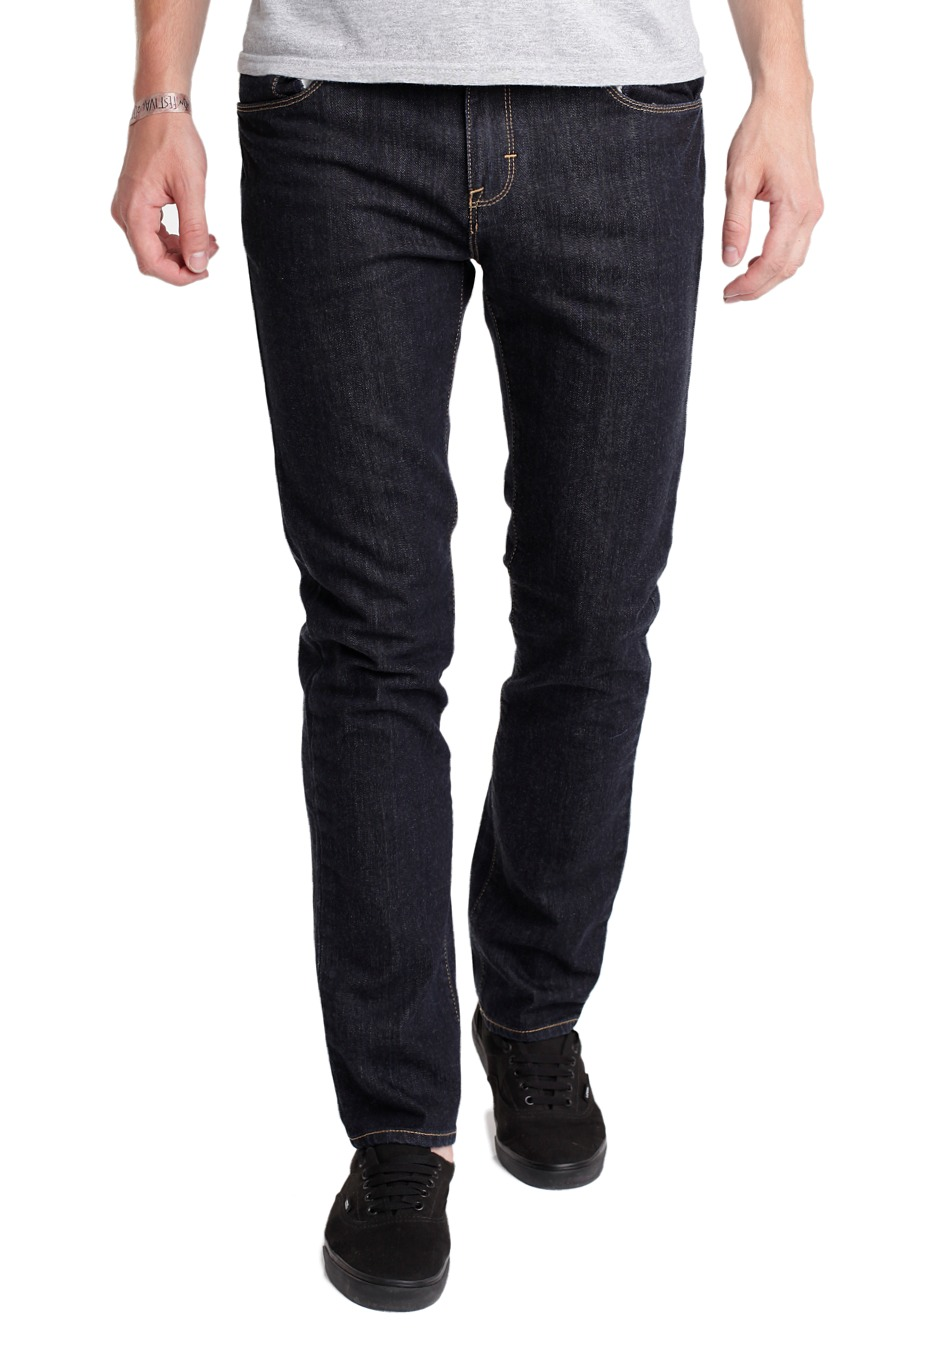 Vans V76 Skinny Dark Indigo Jeans Impericon Com De